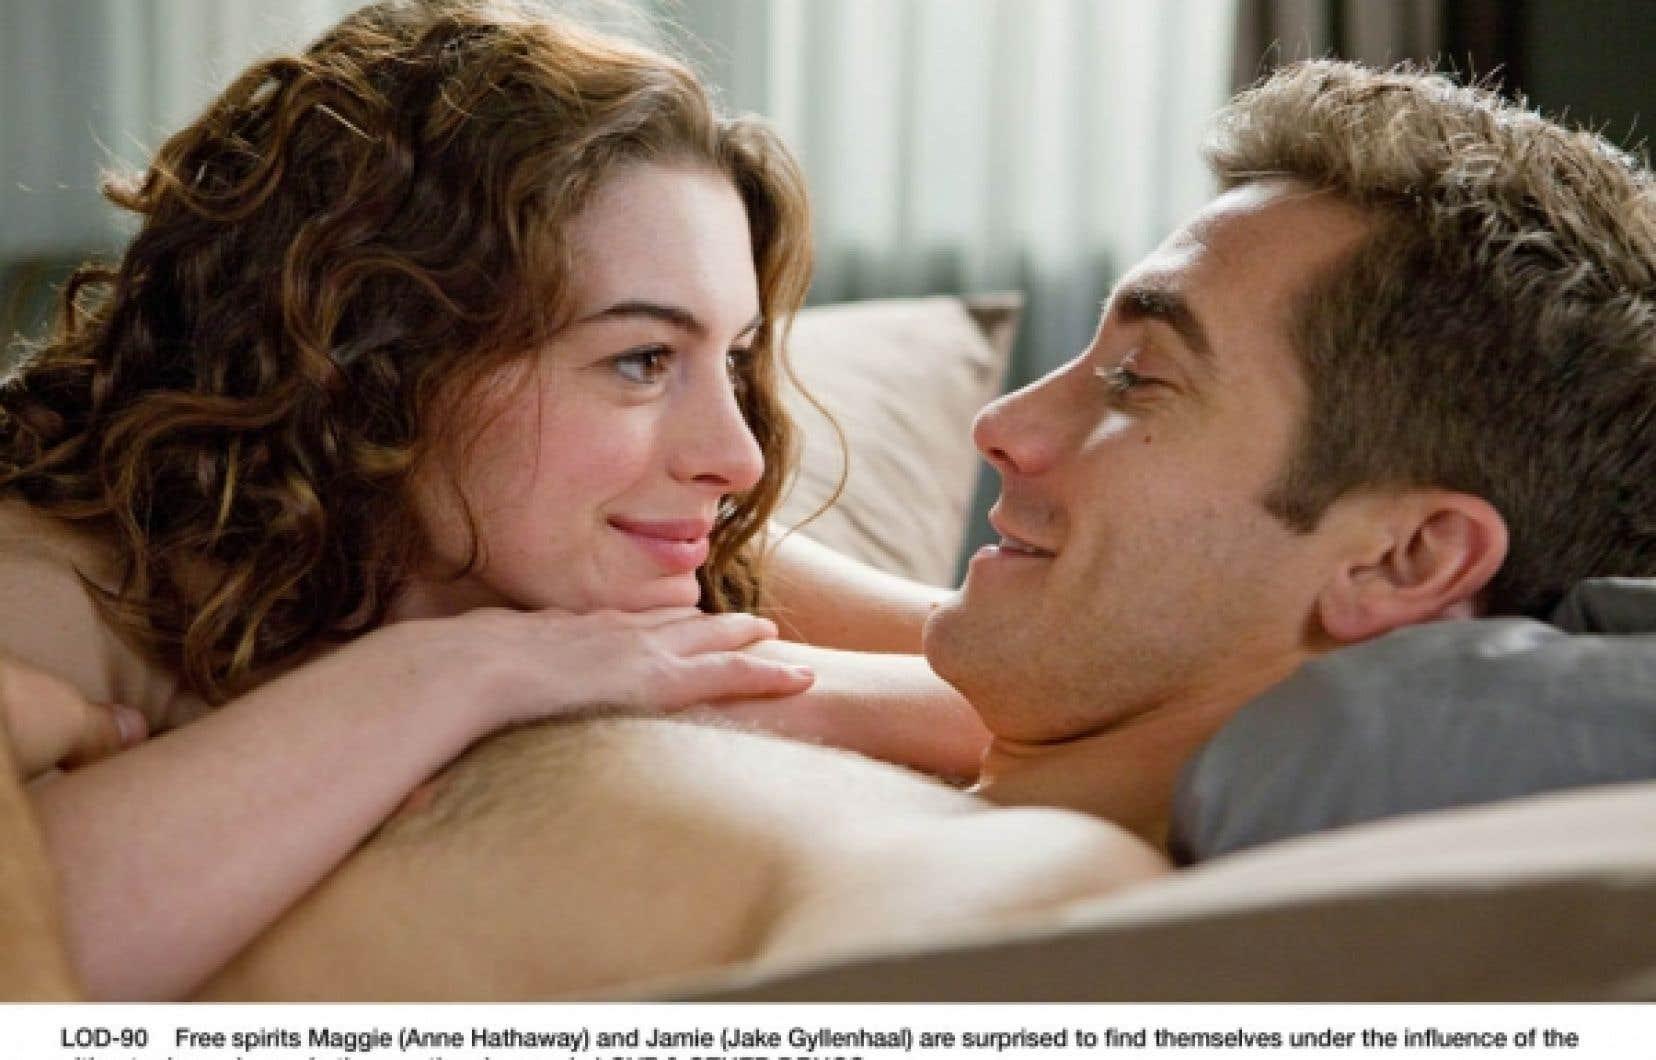 Jake Gyllenhaal et Anne Hathaway dans une scène de Love and Other Drugs.<br />